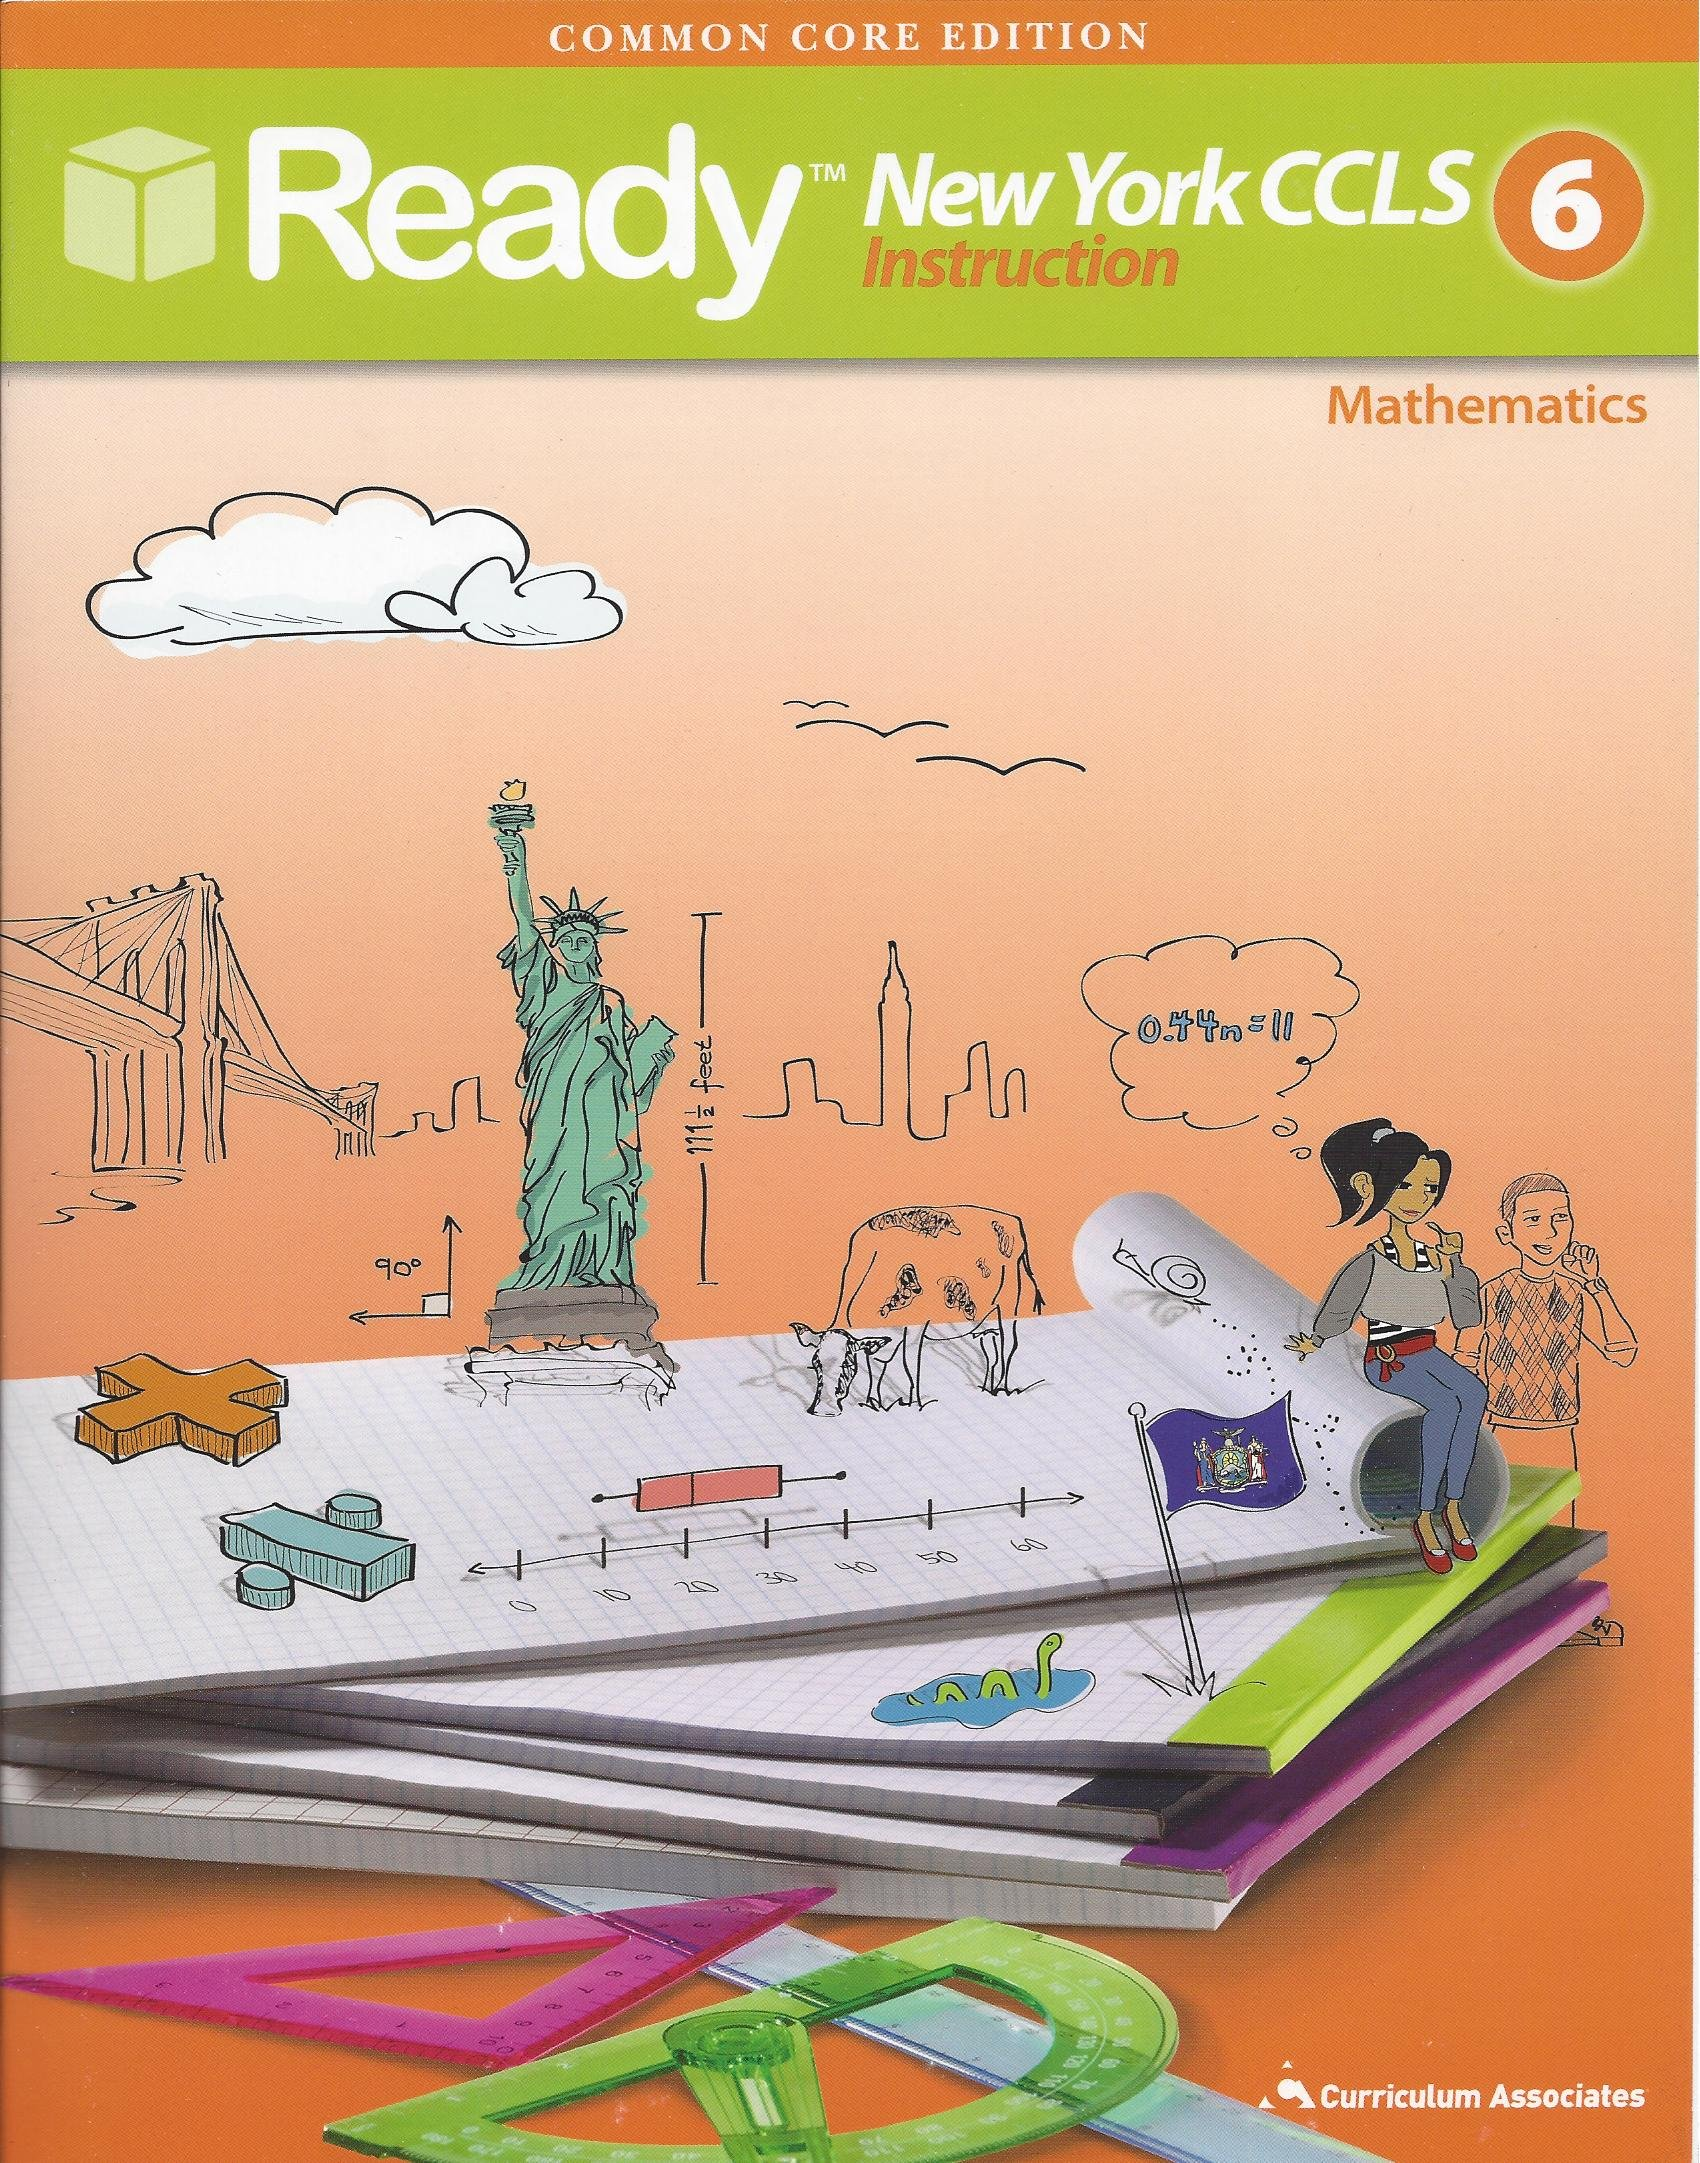 Amazon Com Ready Common Core New York Ccls Grade 6 Mathematics Ready 9780760978344 Books